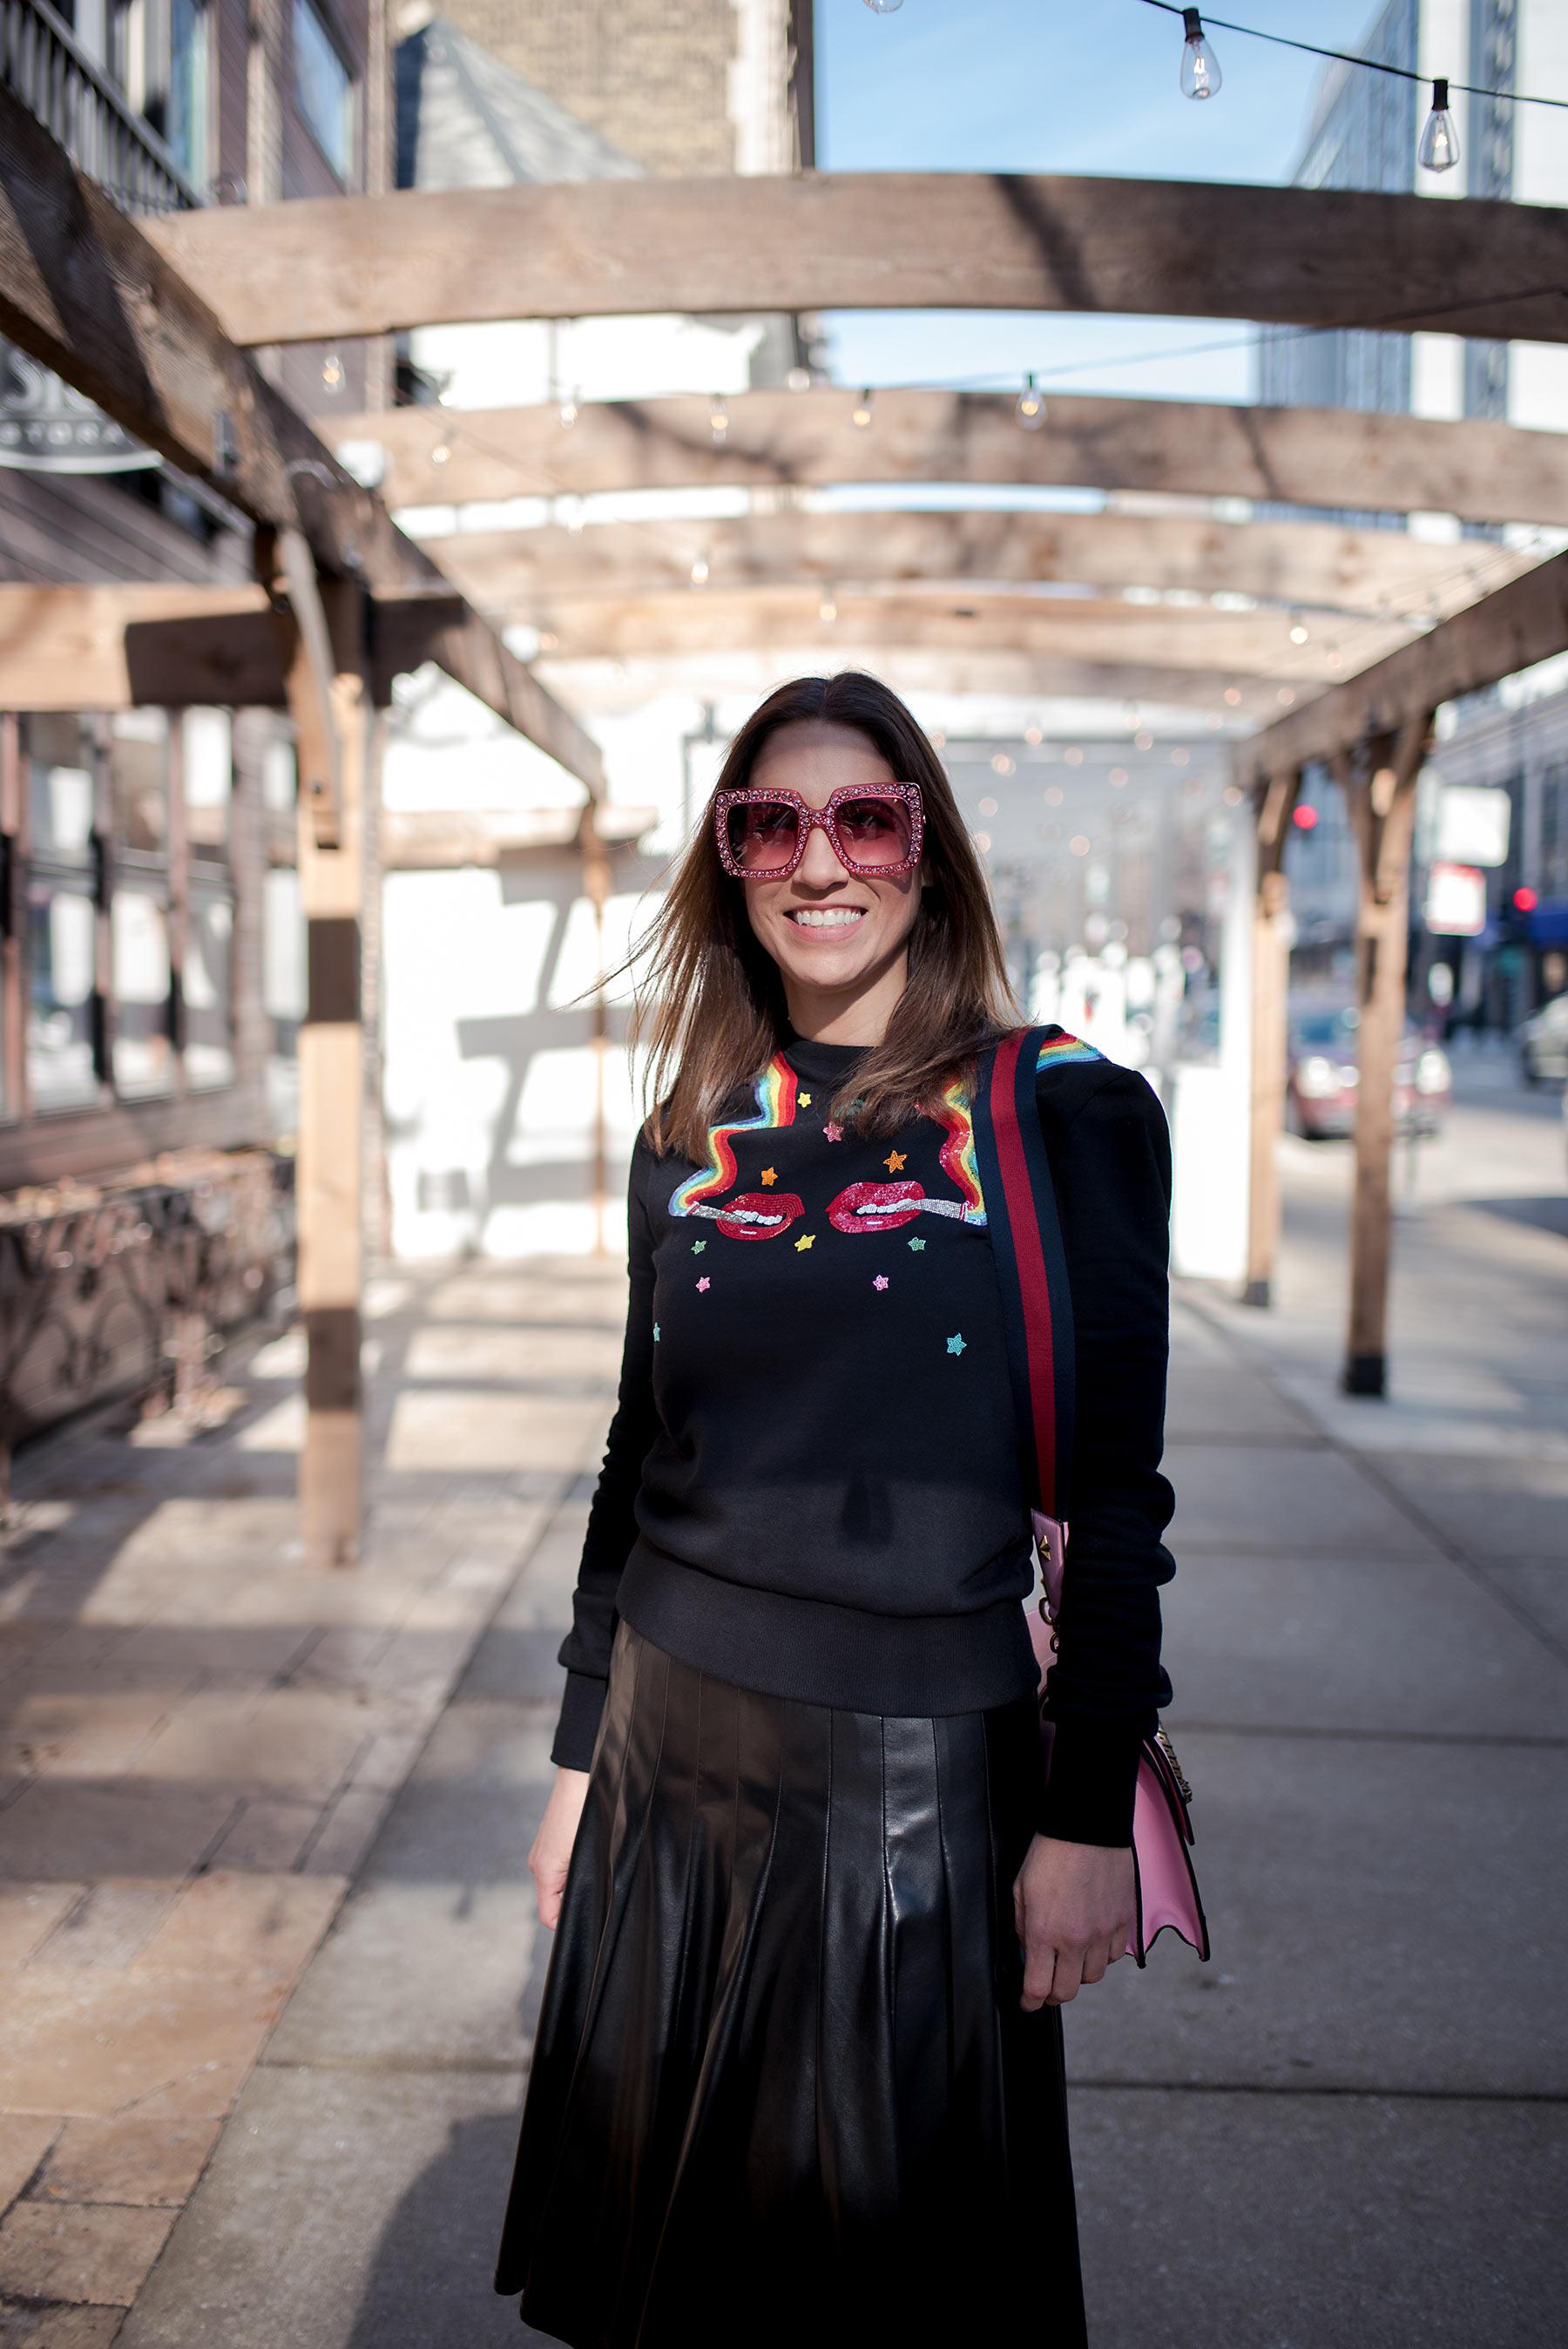 Anna Roufos Sosa of Noir Friday in an Olympia Le-Tan sweatshirt.